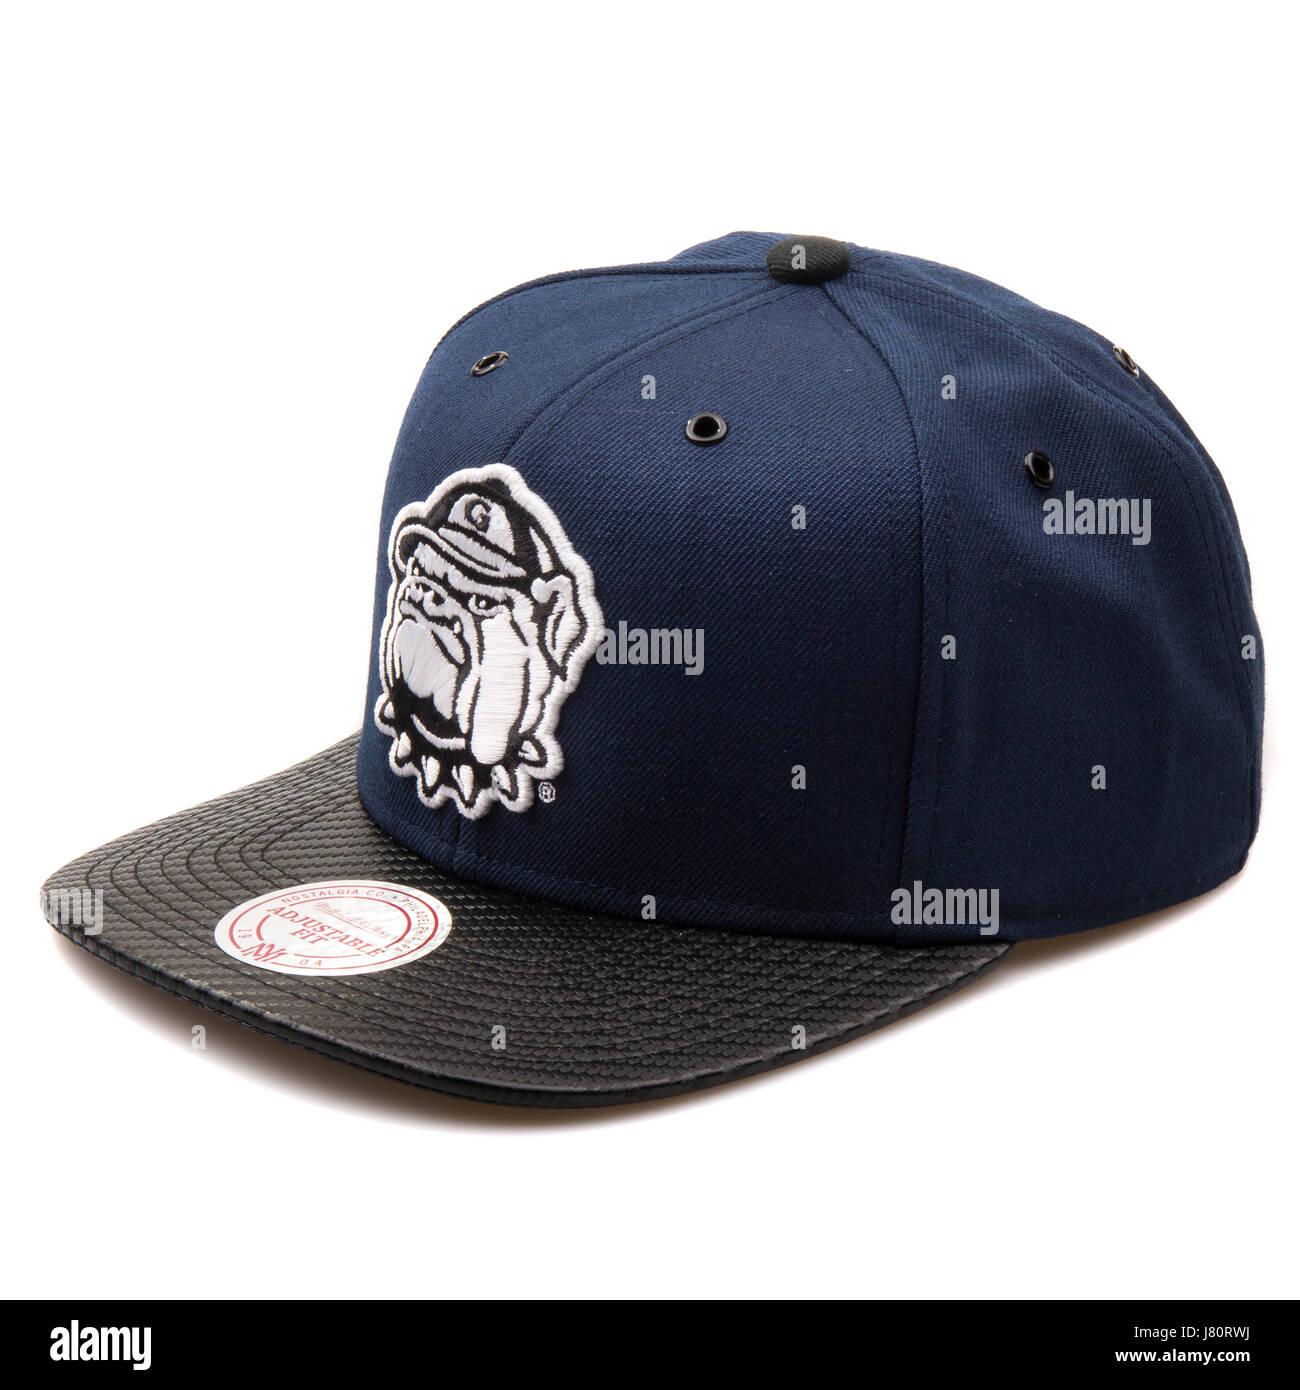 promo code 5c145 cd943 Mitchell   Ness Dark Blue and Black Georgetown Hoyas Cap